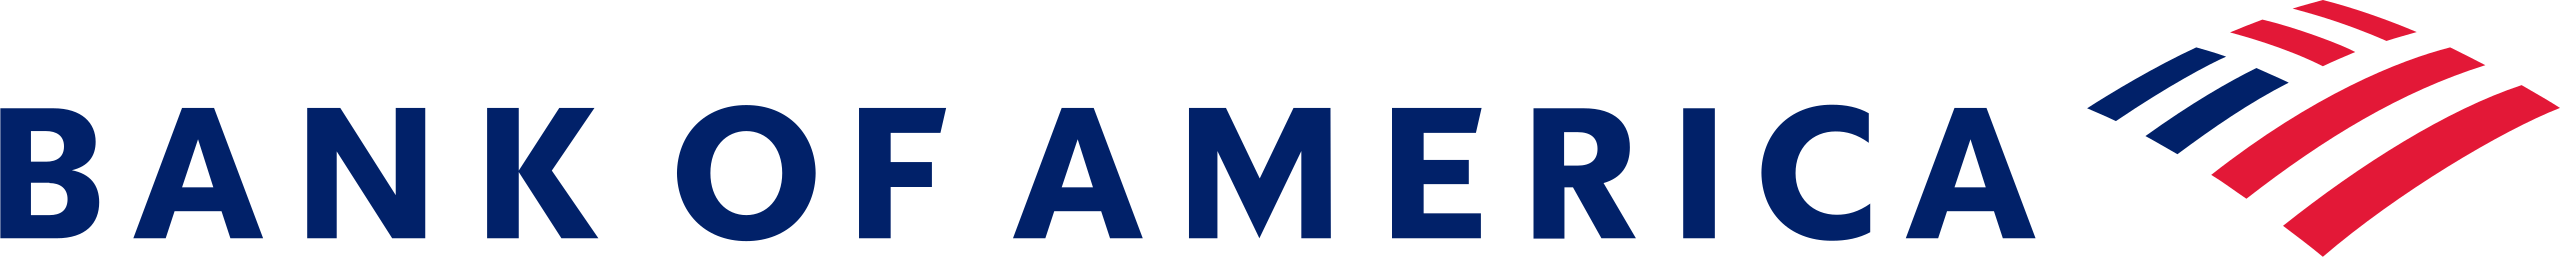 Logotipo Bank Of America